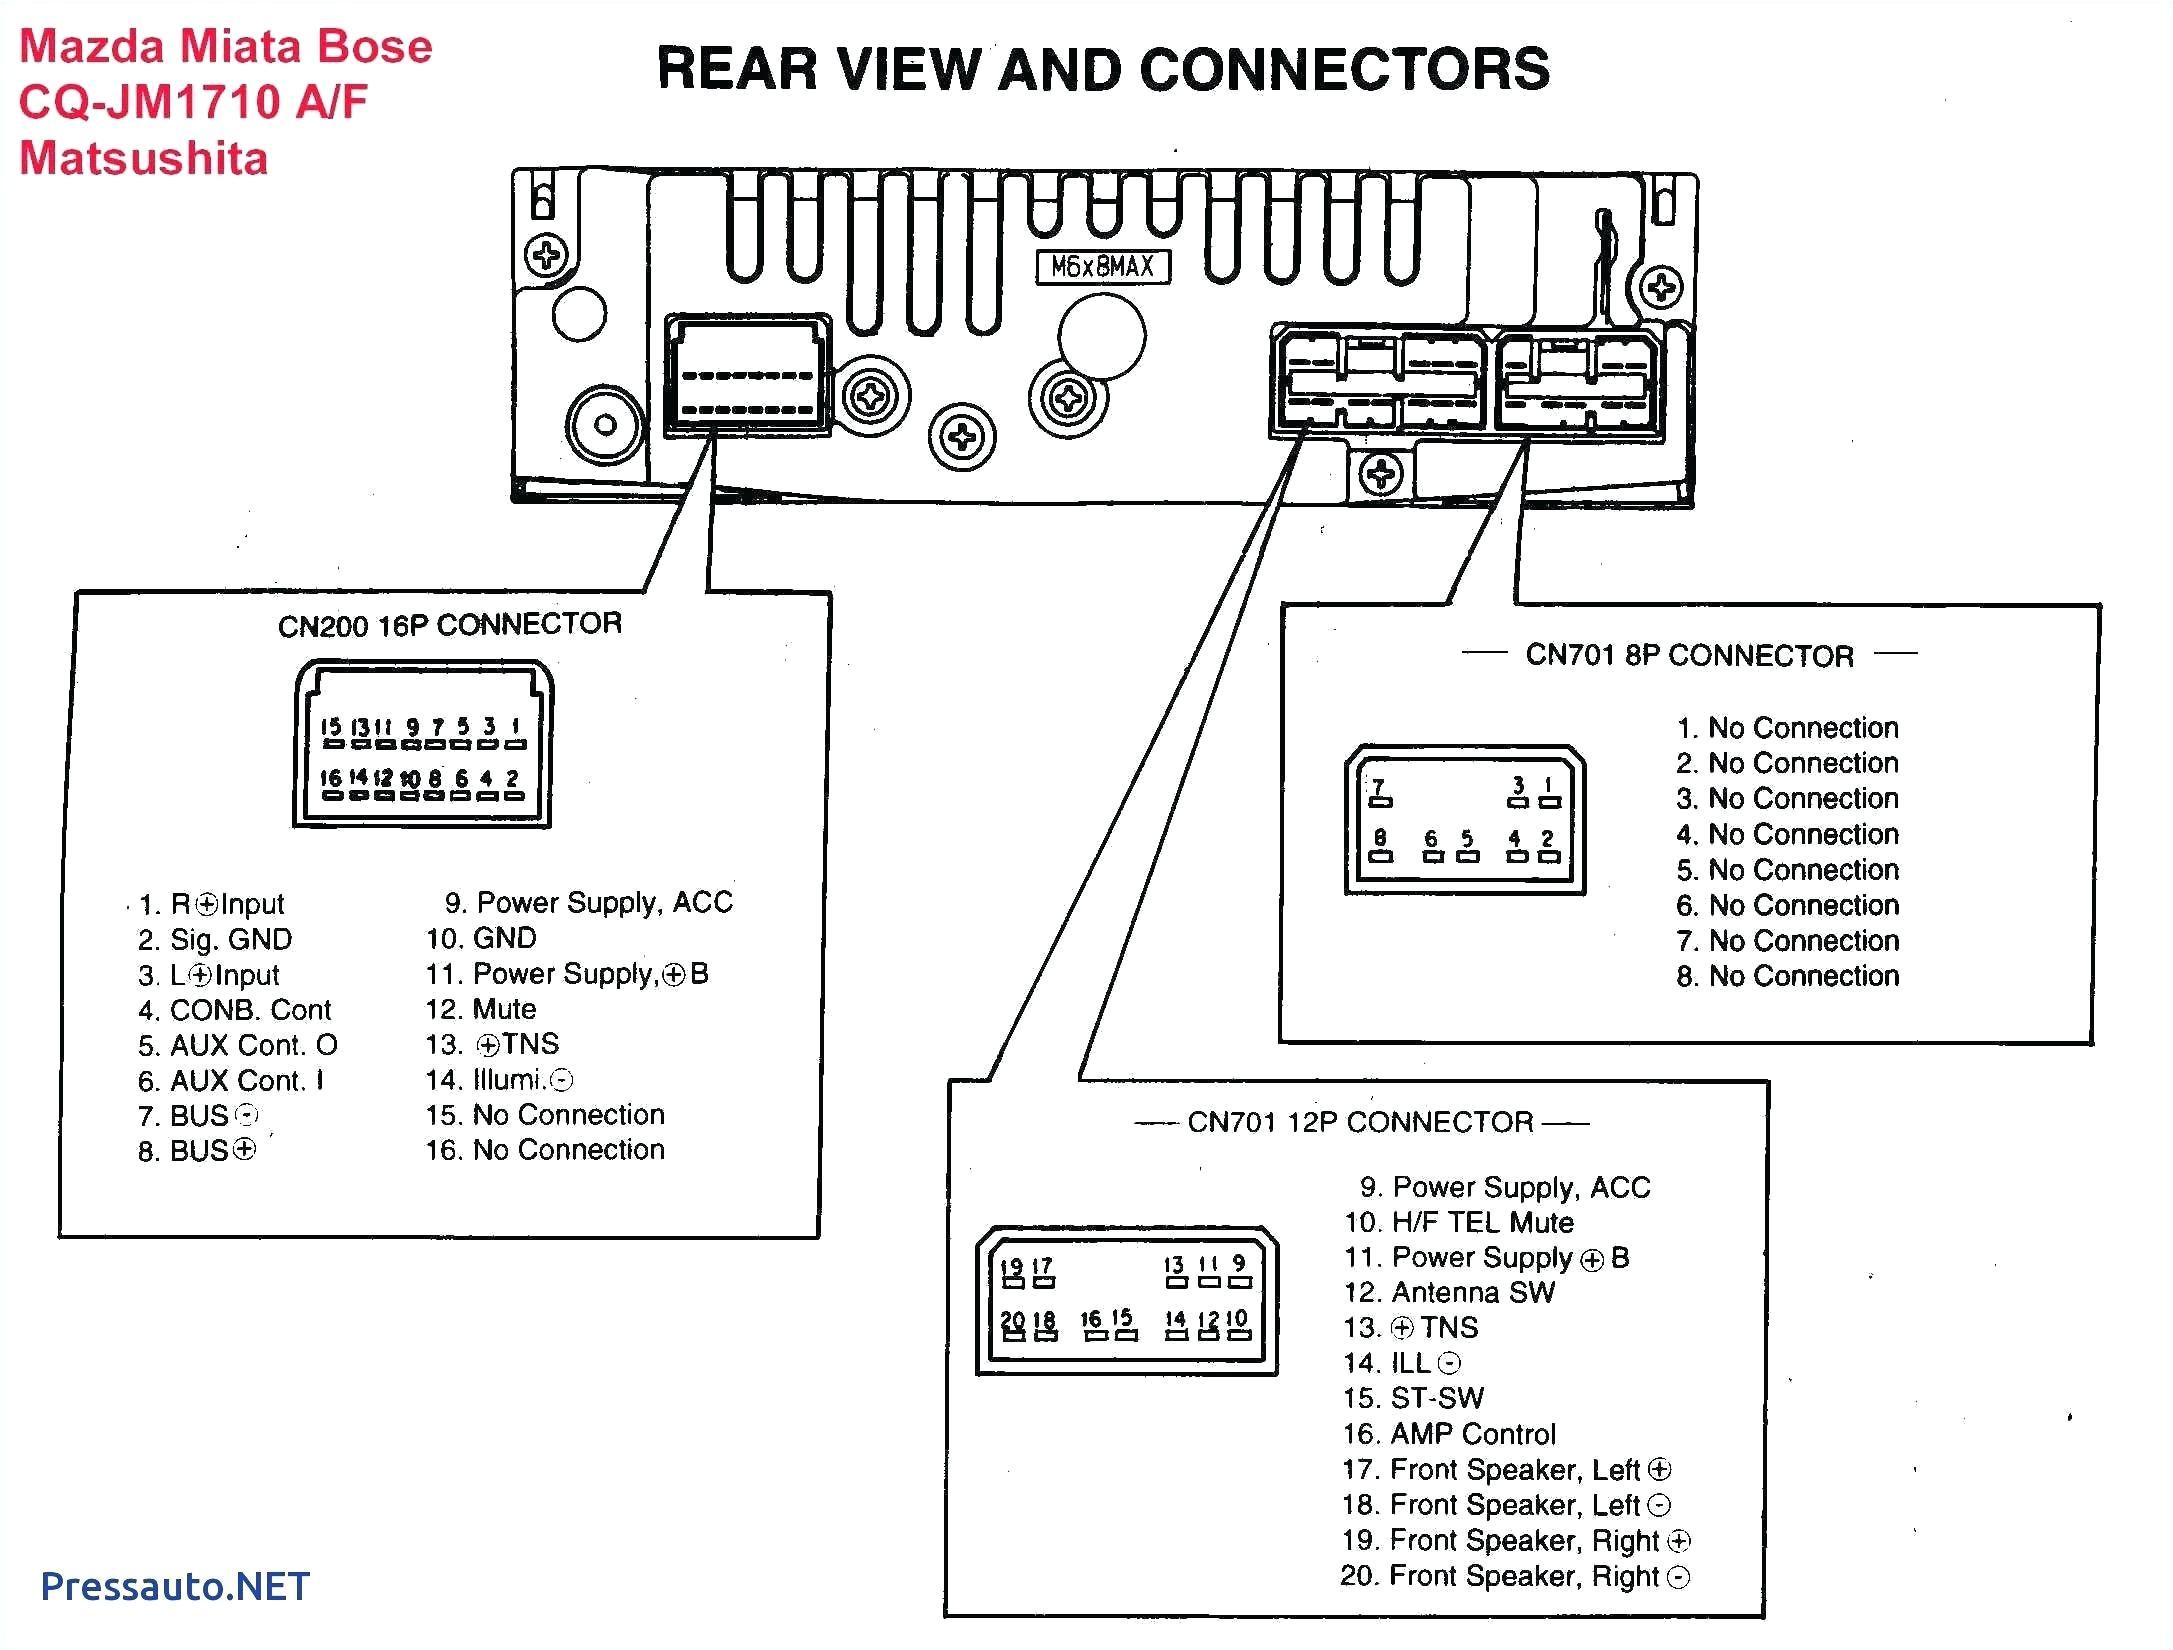 e53 wiring diagram wiring diagram2000 bmw e53 wiring diagram wiring diagram repair guideswrg 6273 bmw